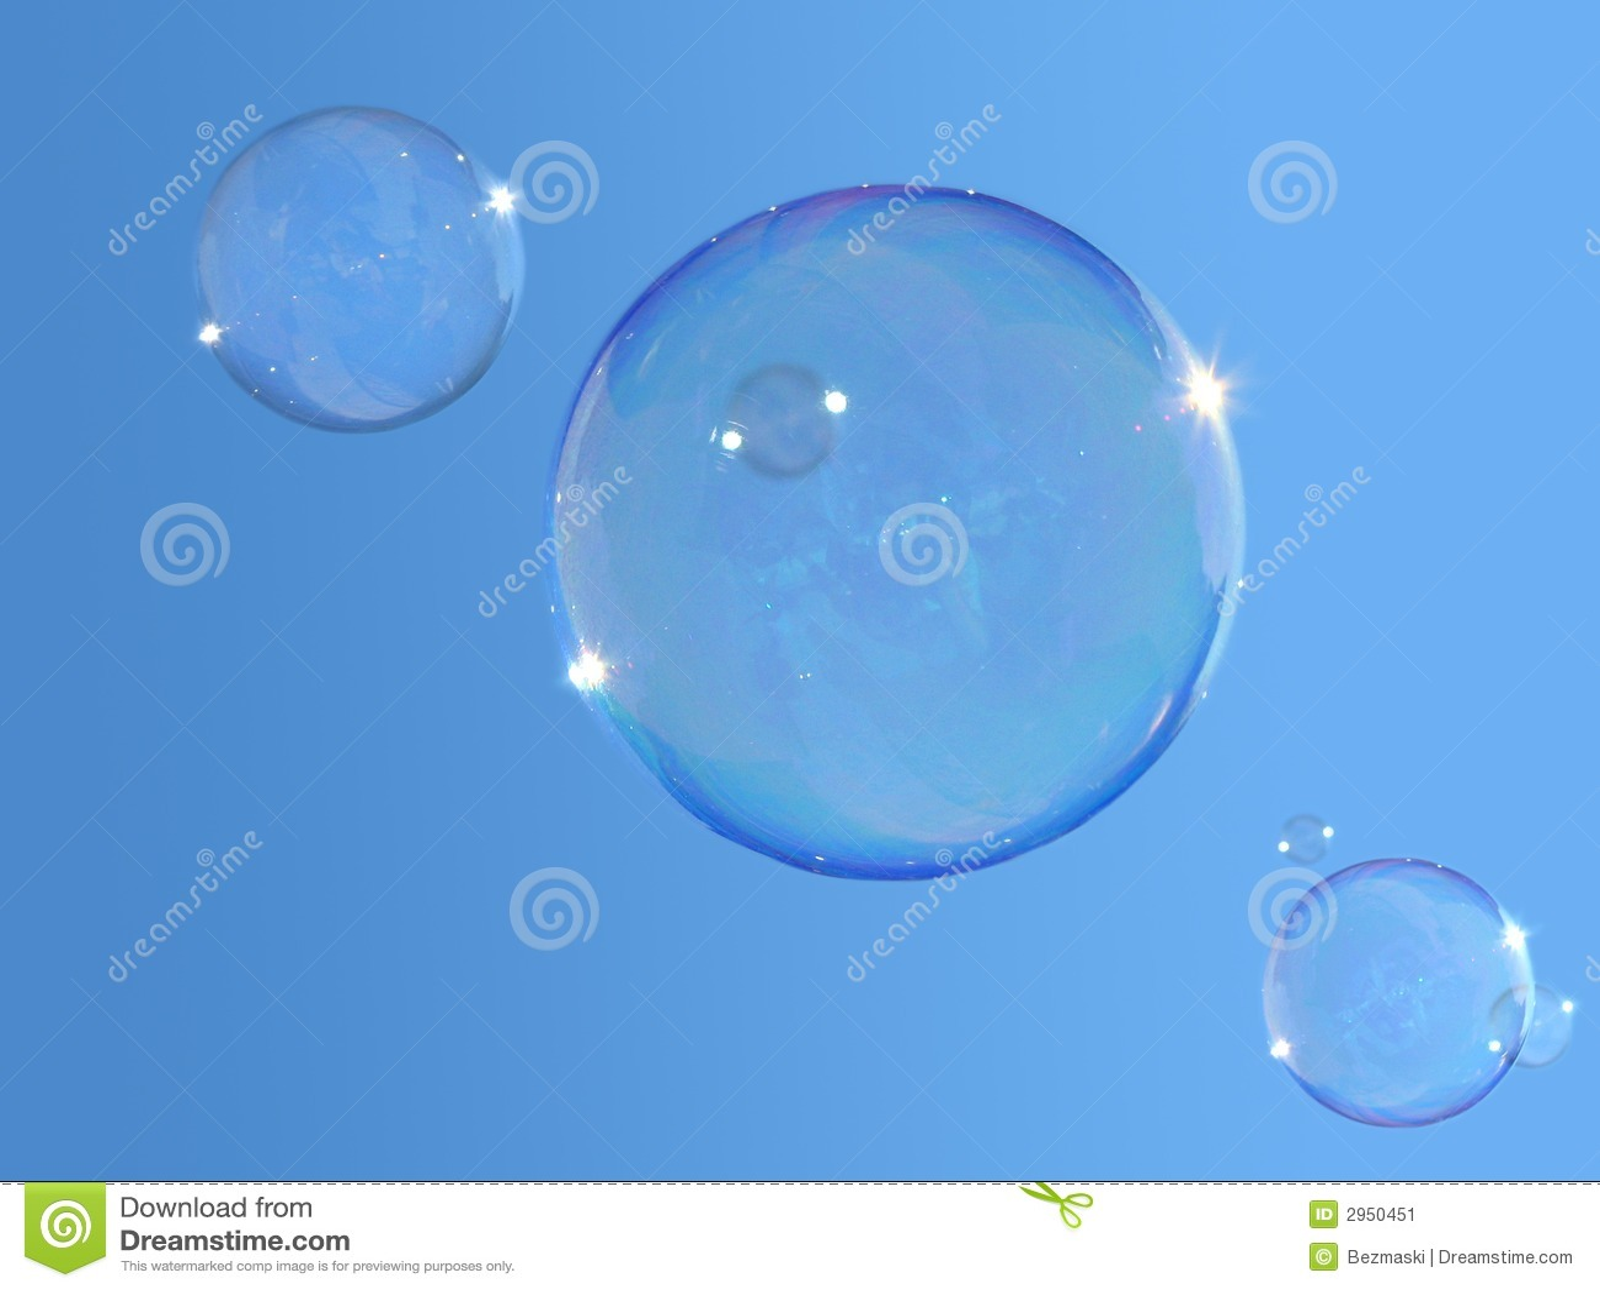 Soap-bubbles on blue sky